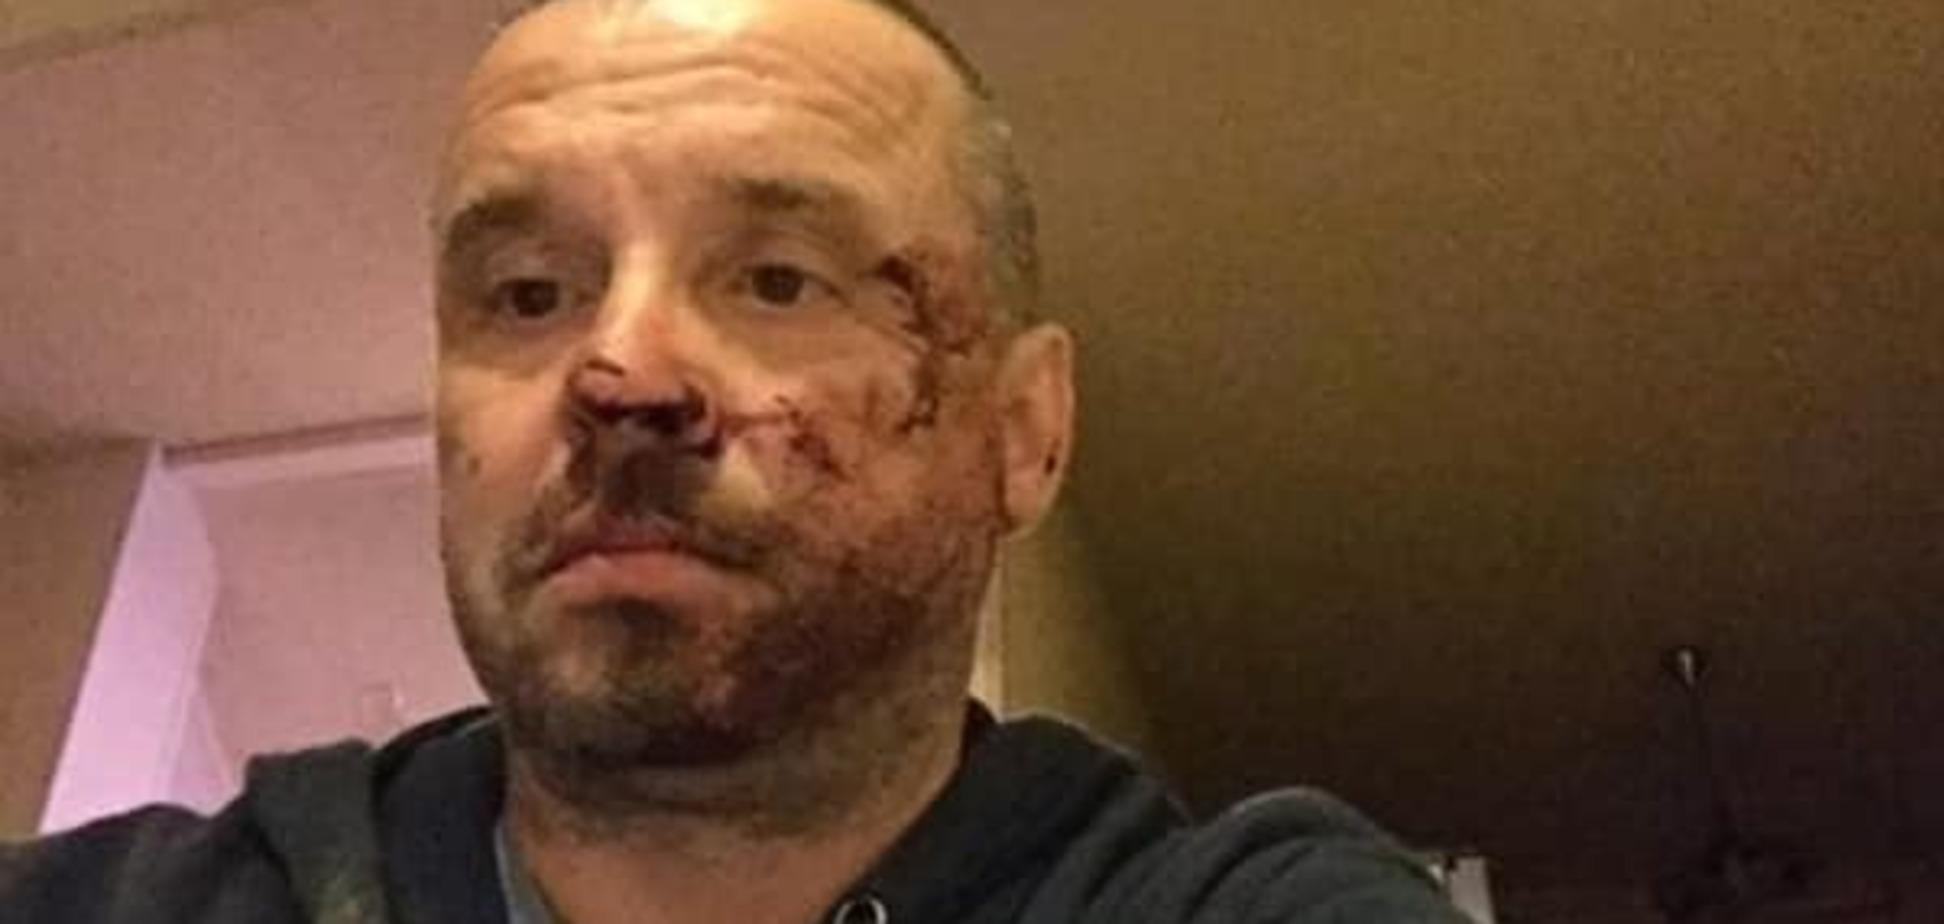 На Донетчине избили председателя областной 'Батьківщини'